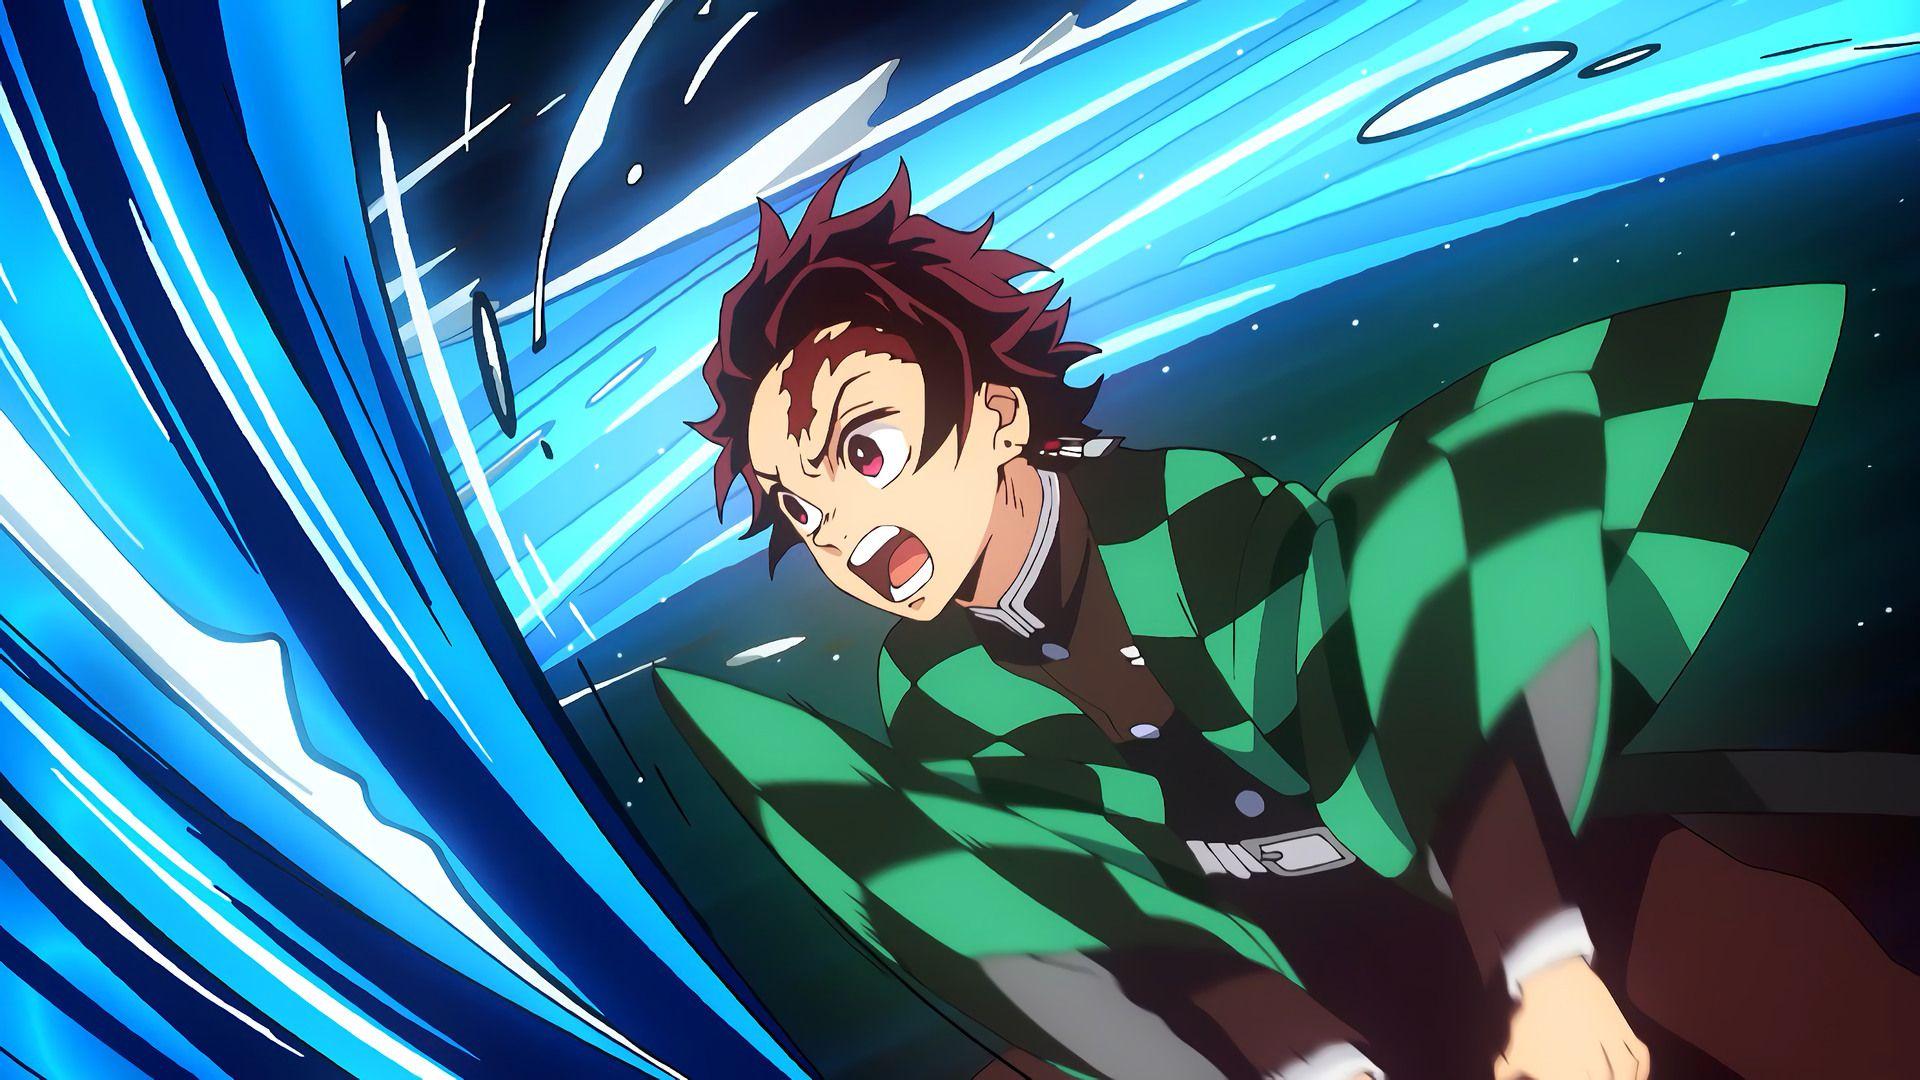 Tanjiro Kamado from Anime Series Kimetsu no Yaiba HD